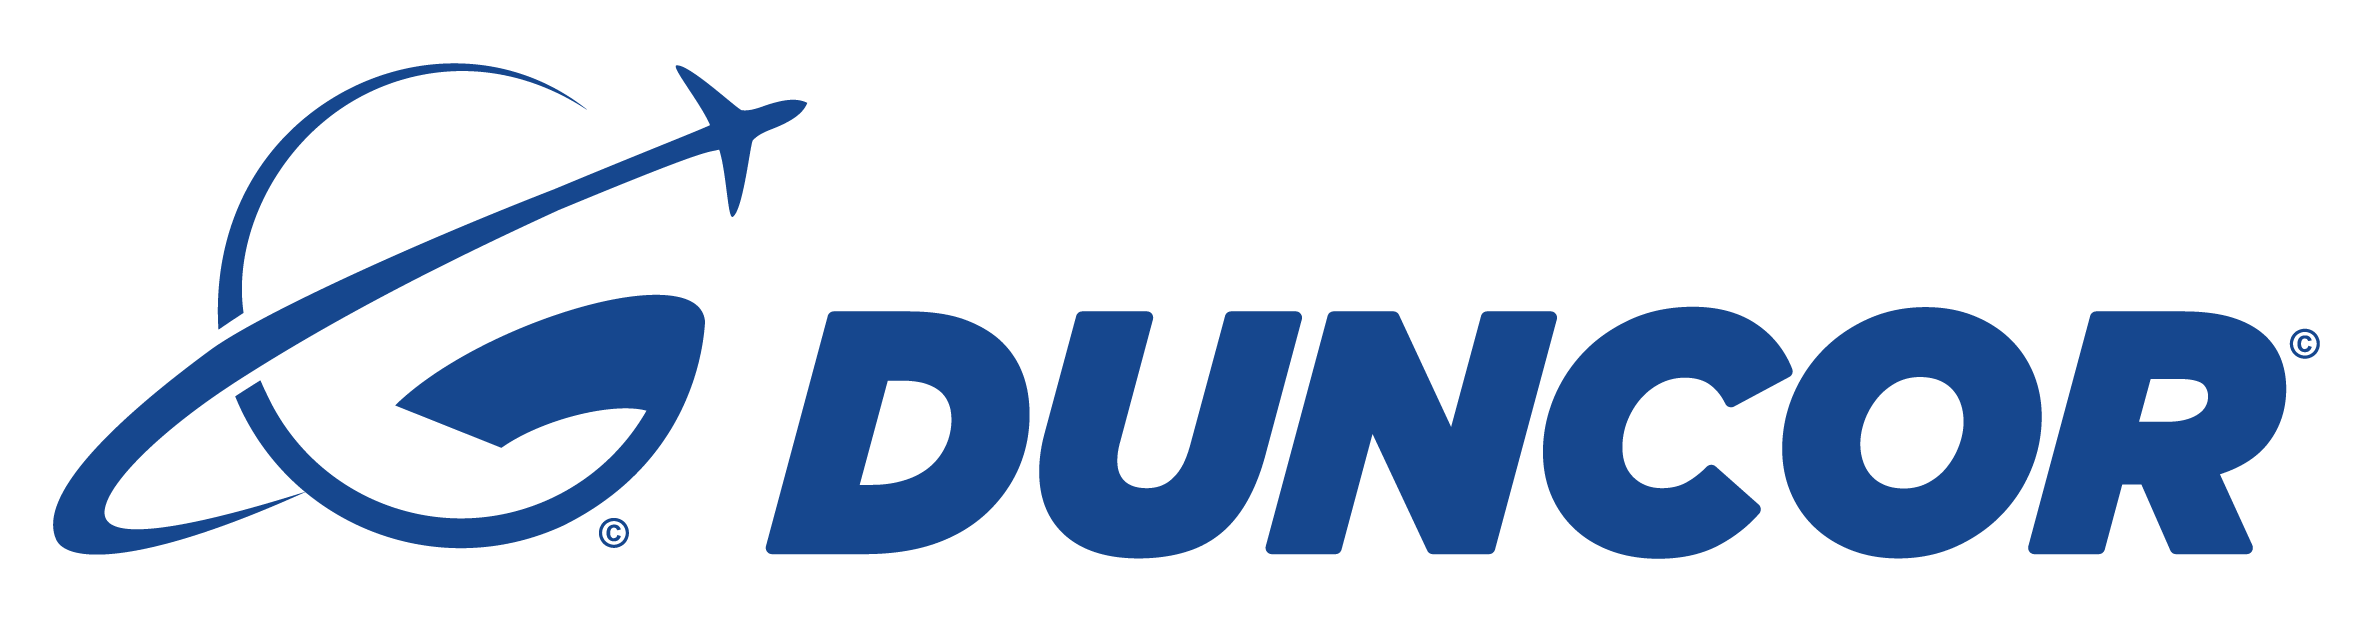 DUNCOR LTD CO LOGO.png